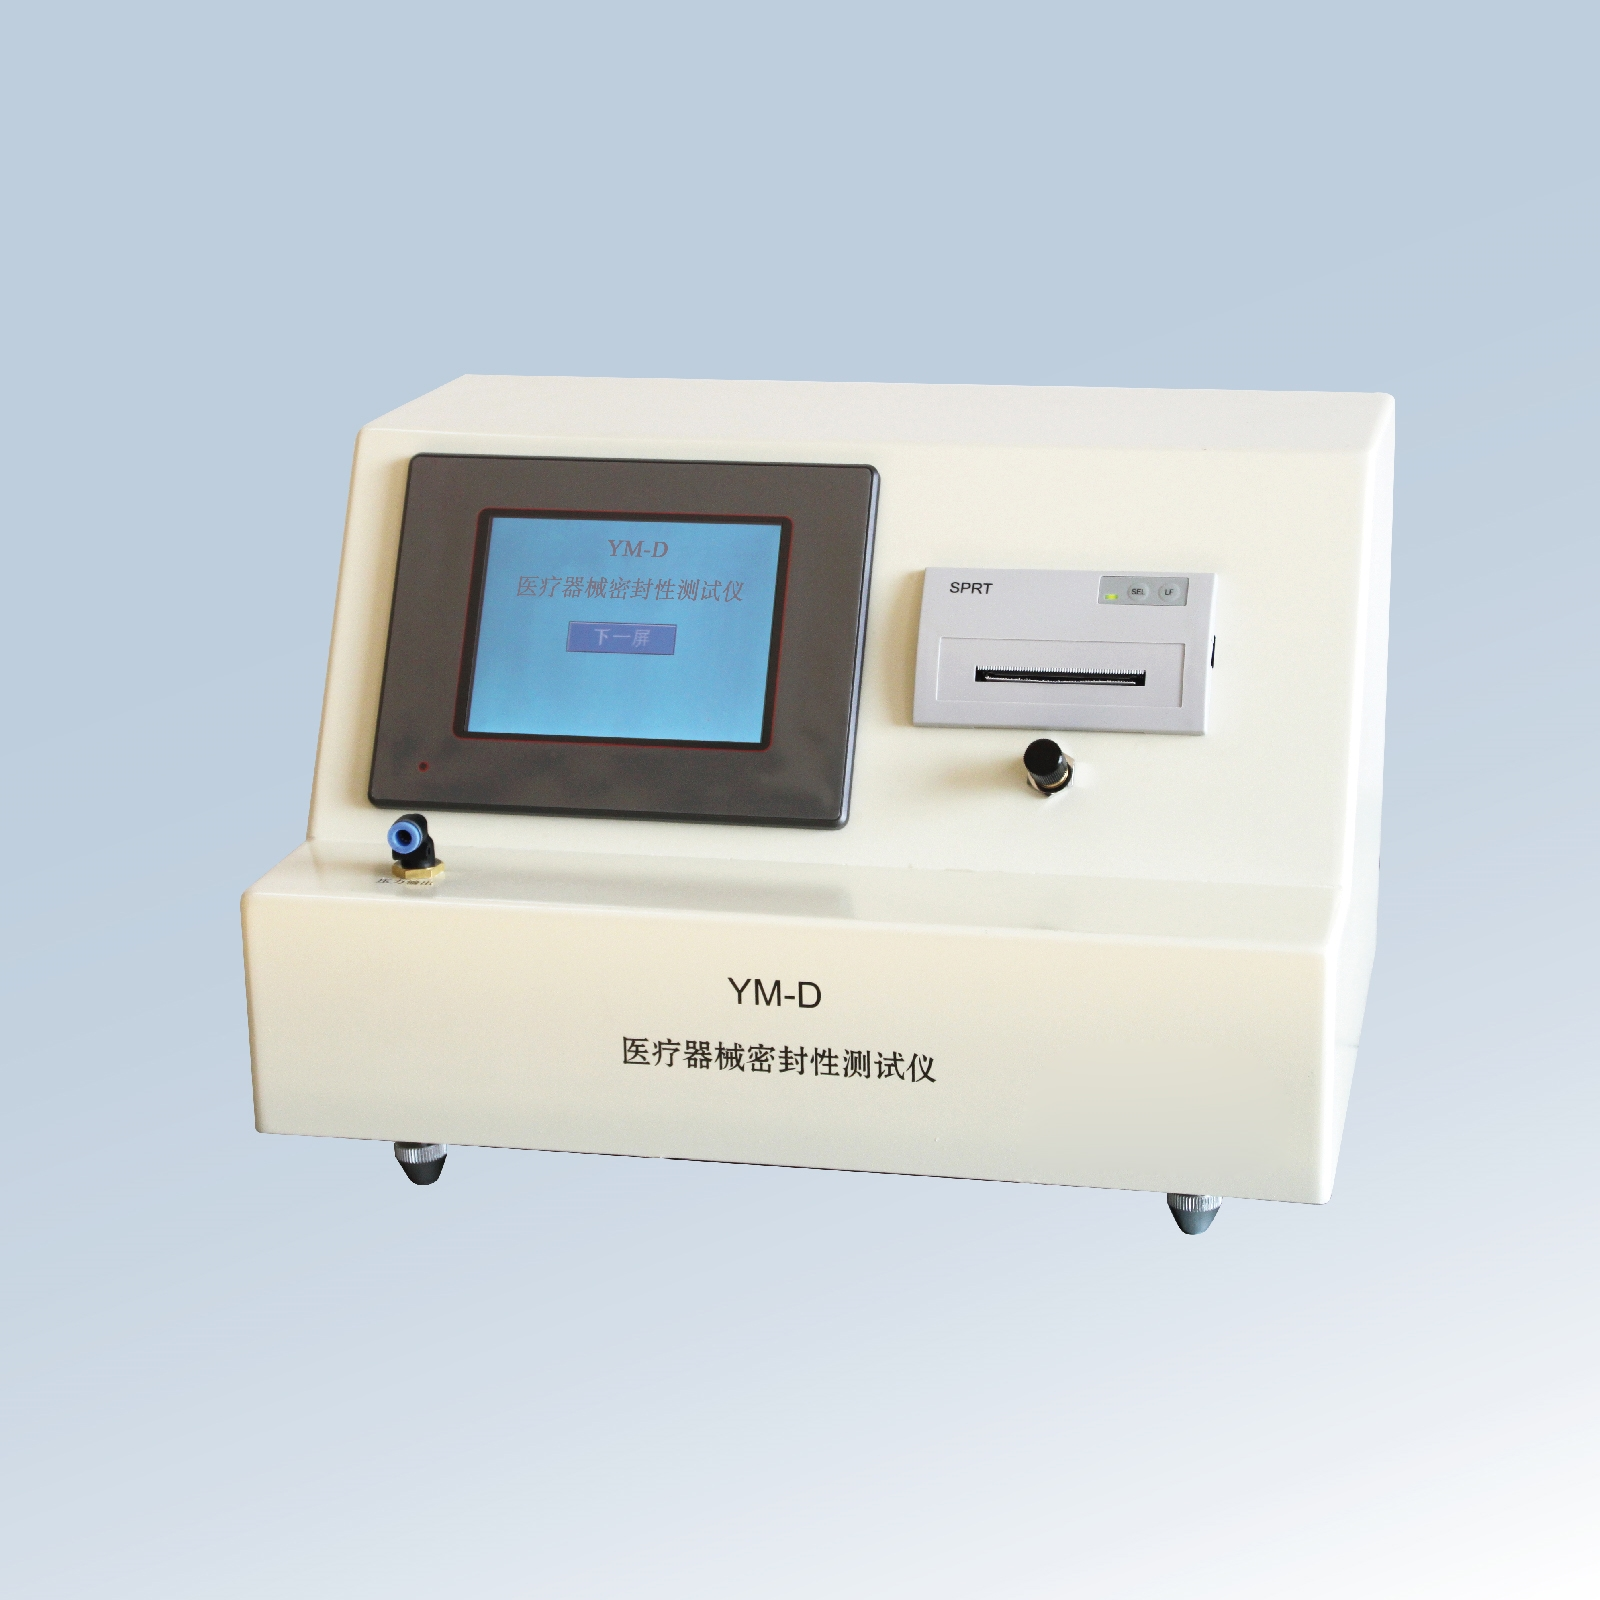 YM-D SY-B YL-D 醫用器械密封性測試儀 輸液泵流量參數測試儀